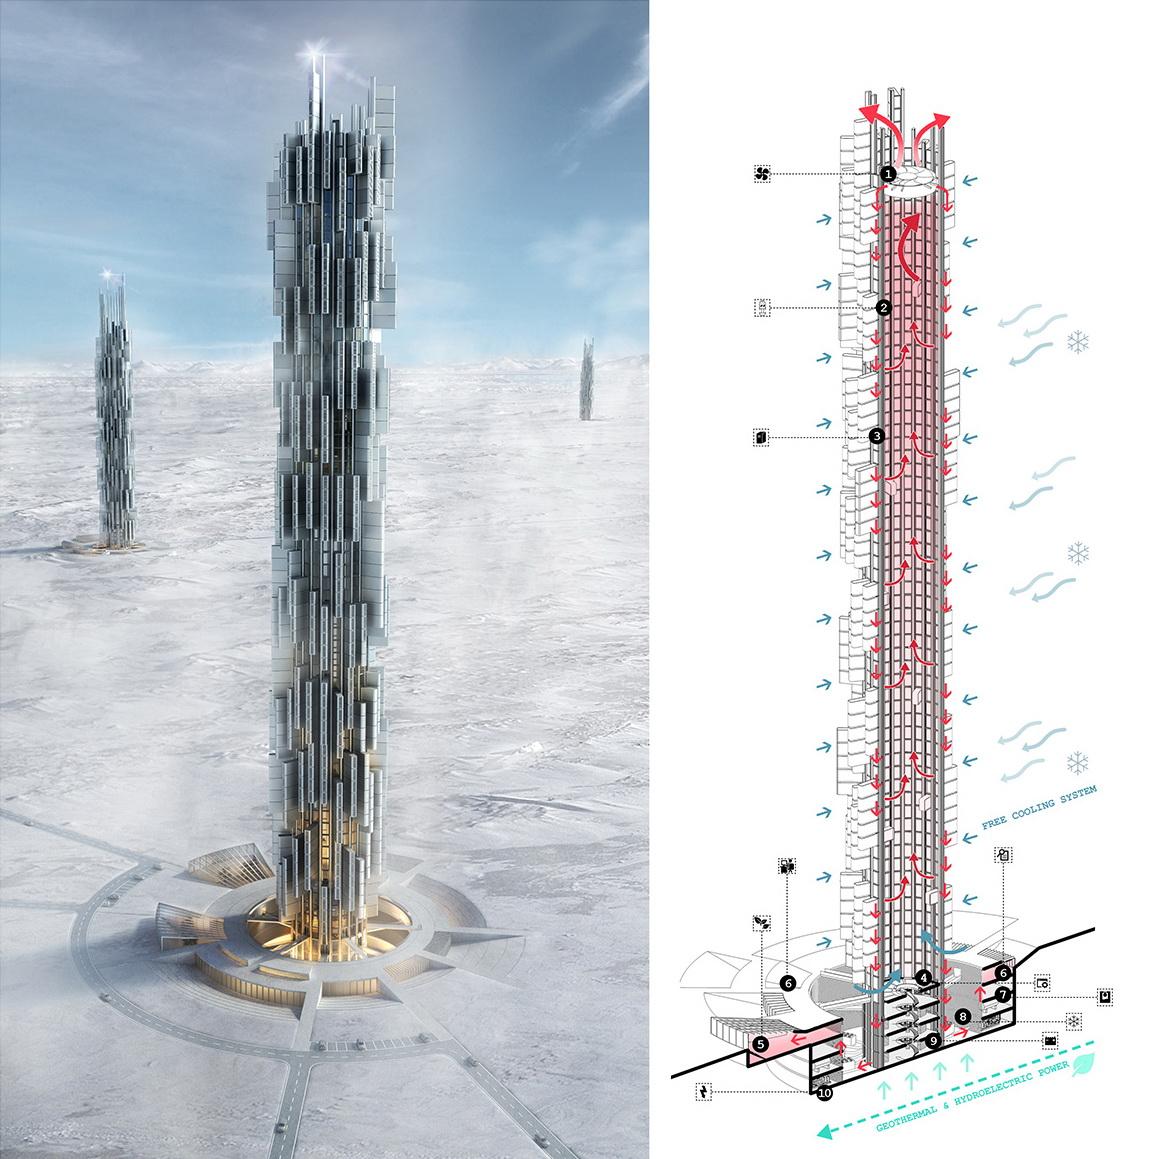 дата-центр Data Tower в форме небоскреба